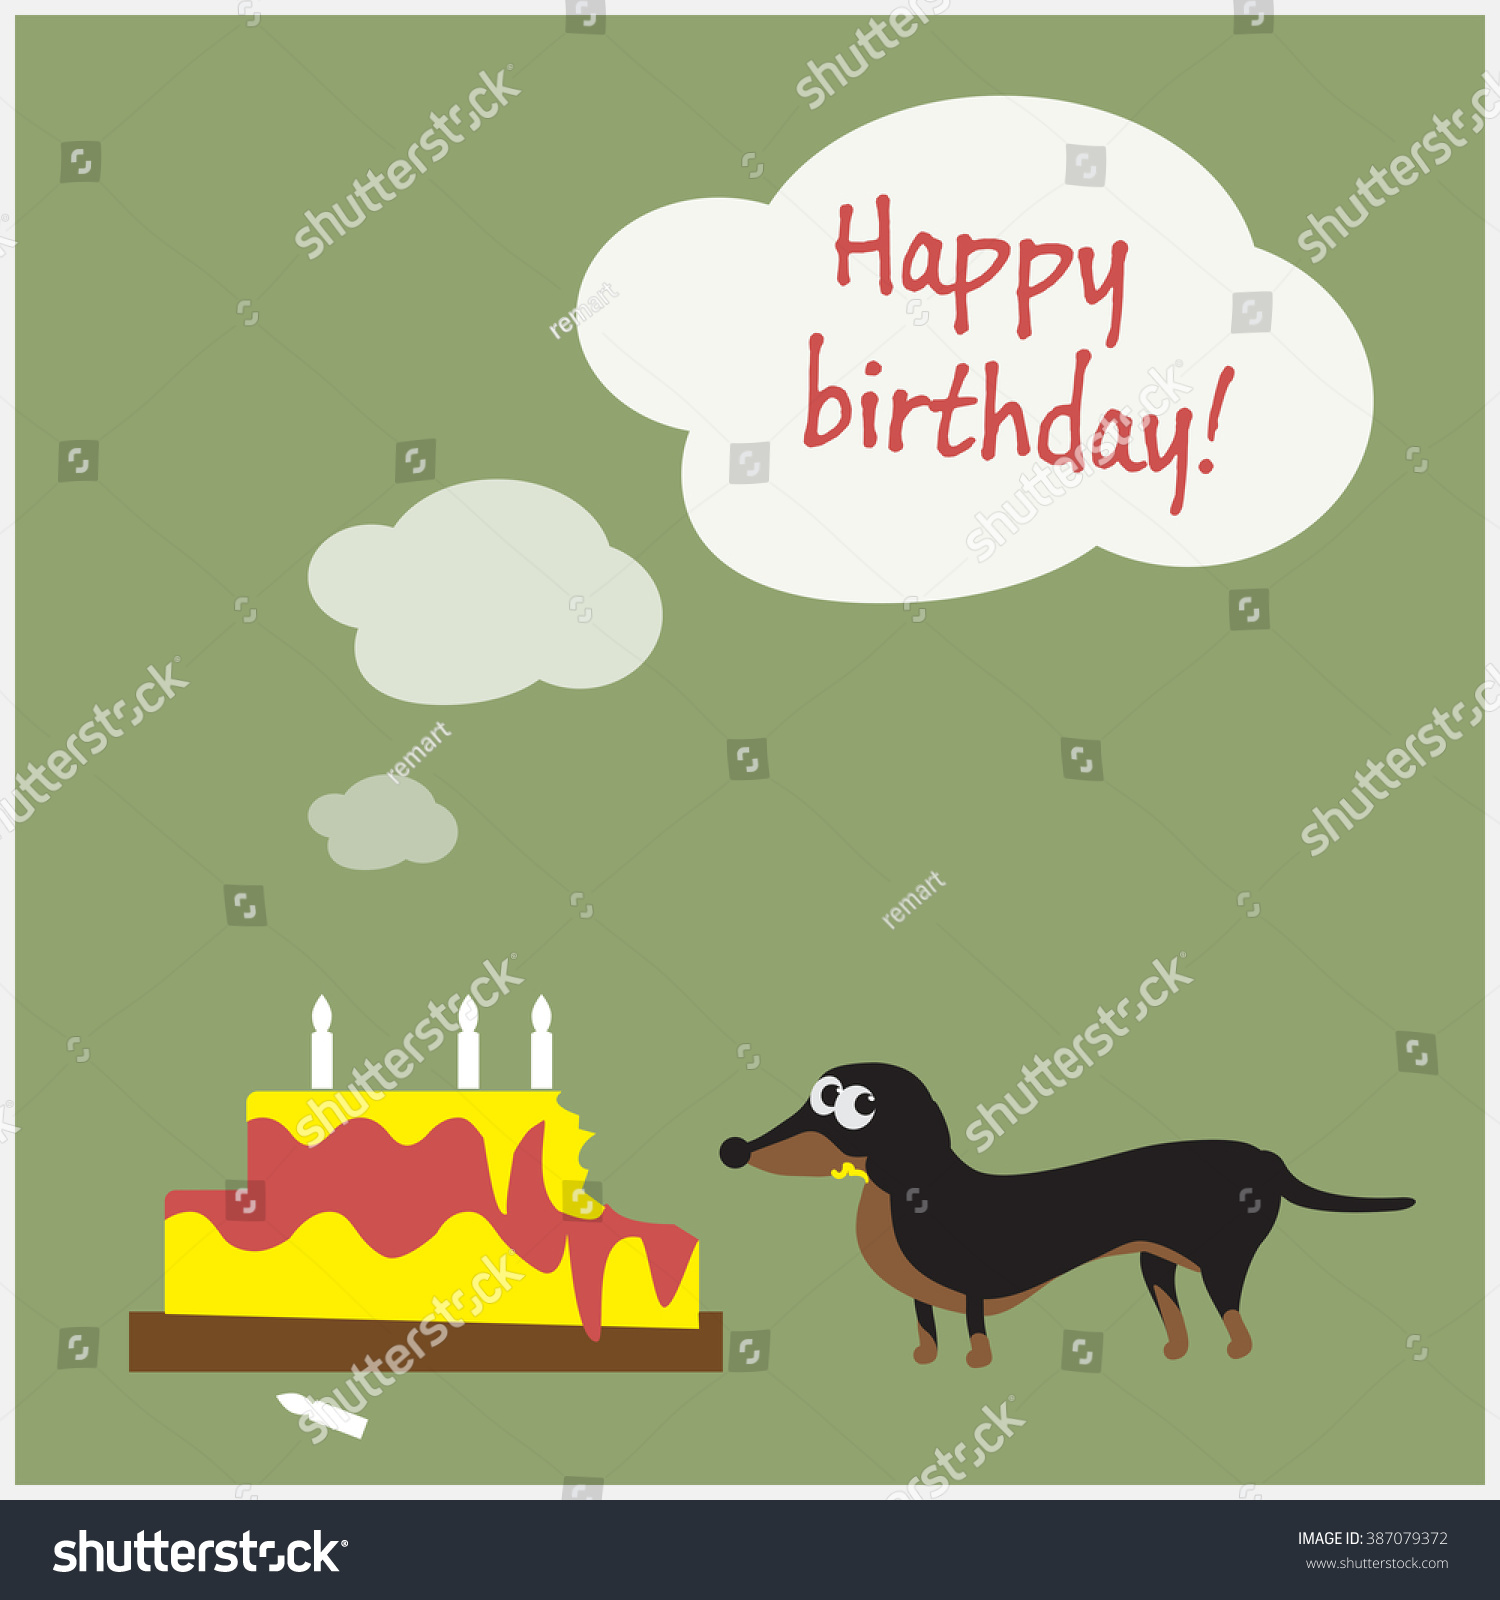 Happy Birthday Greeting Card Innocent Dachshund Stock Vector